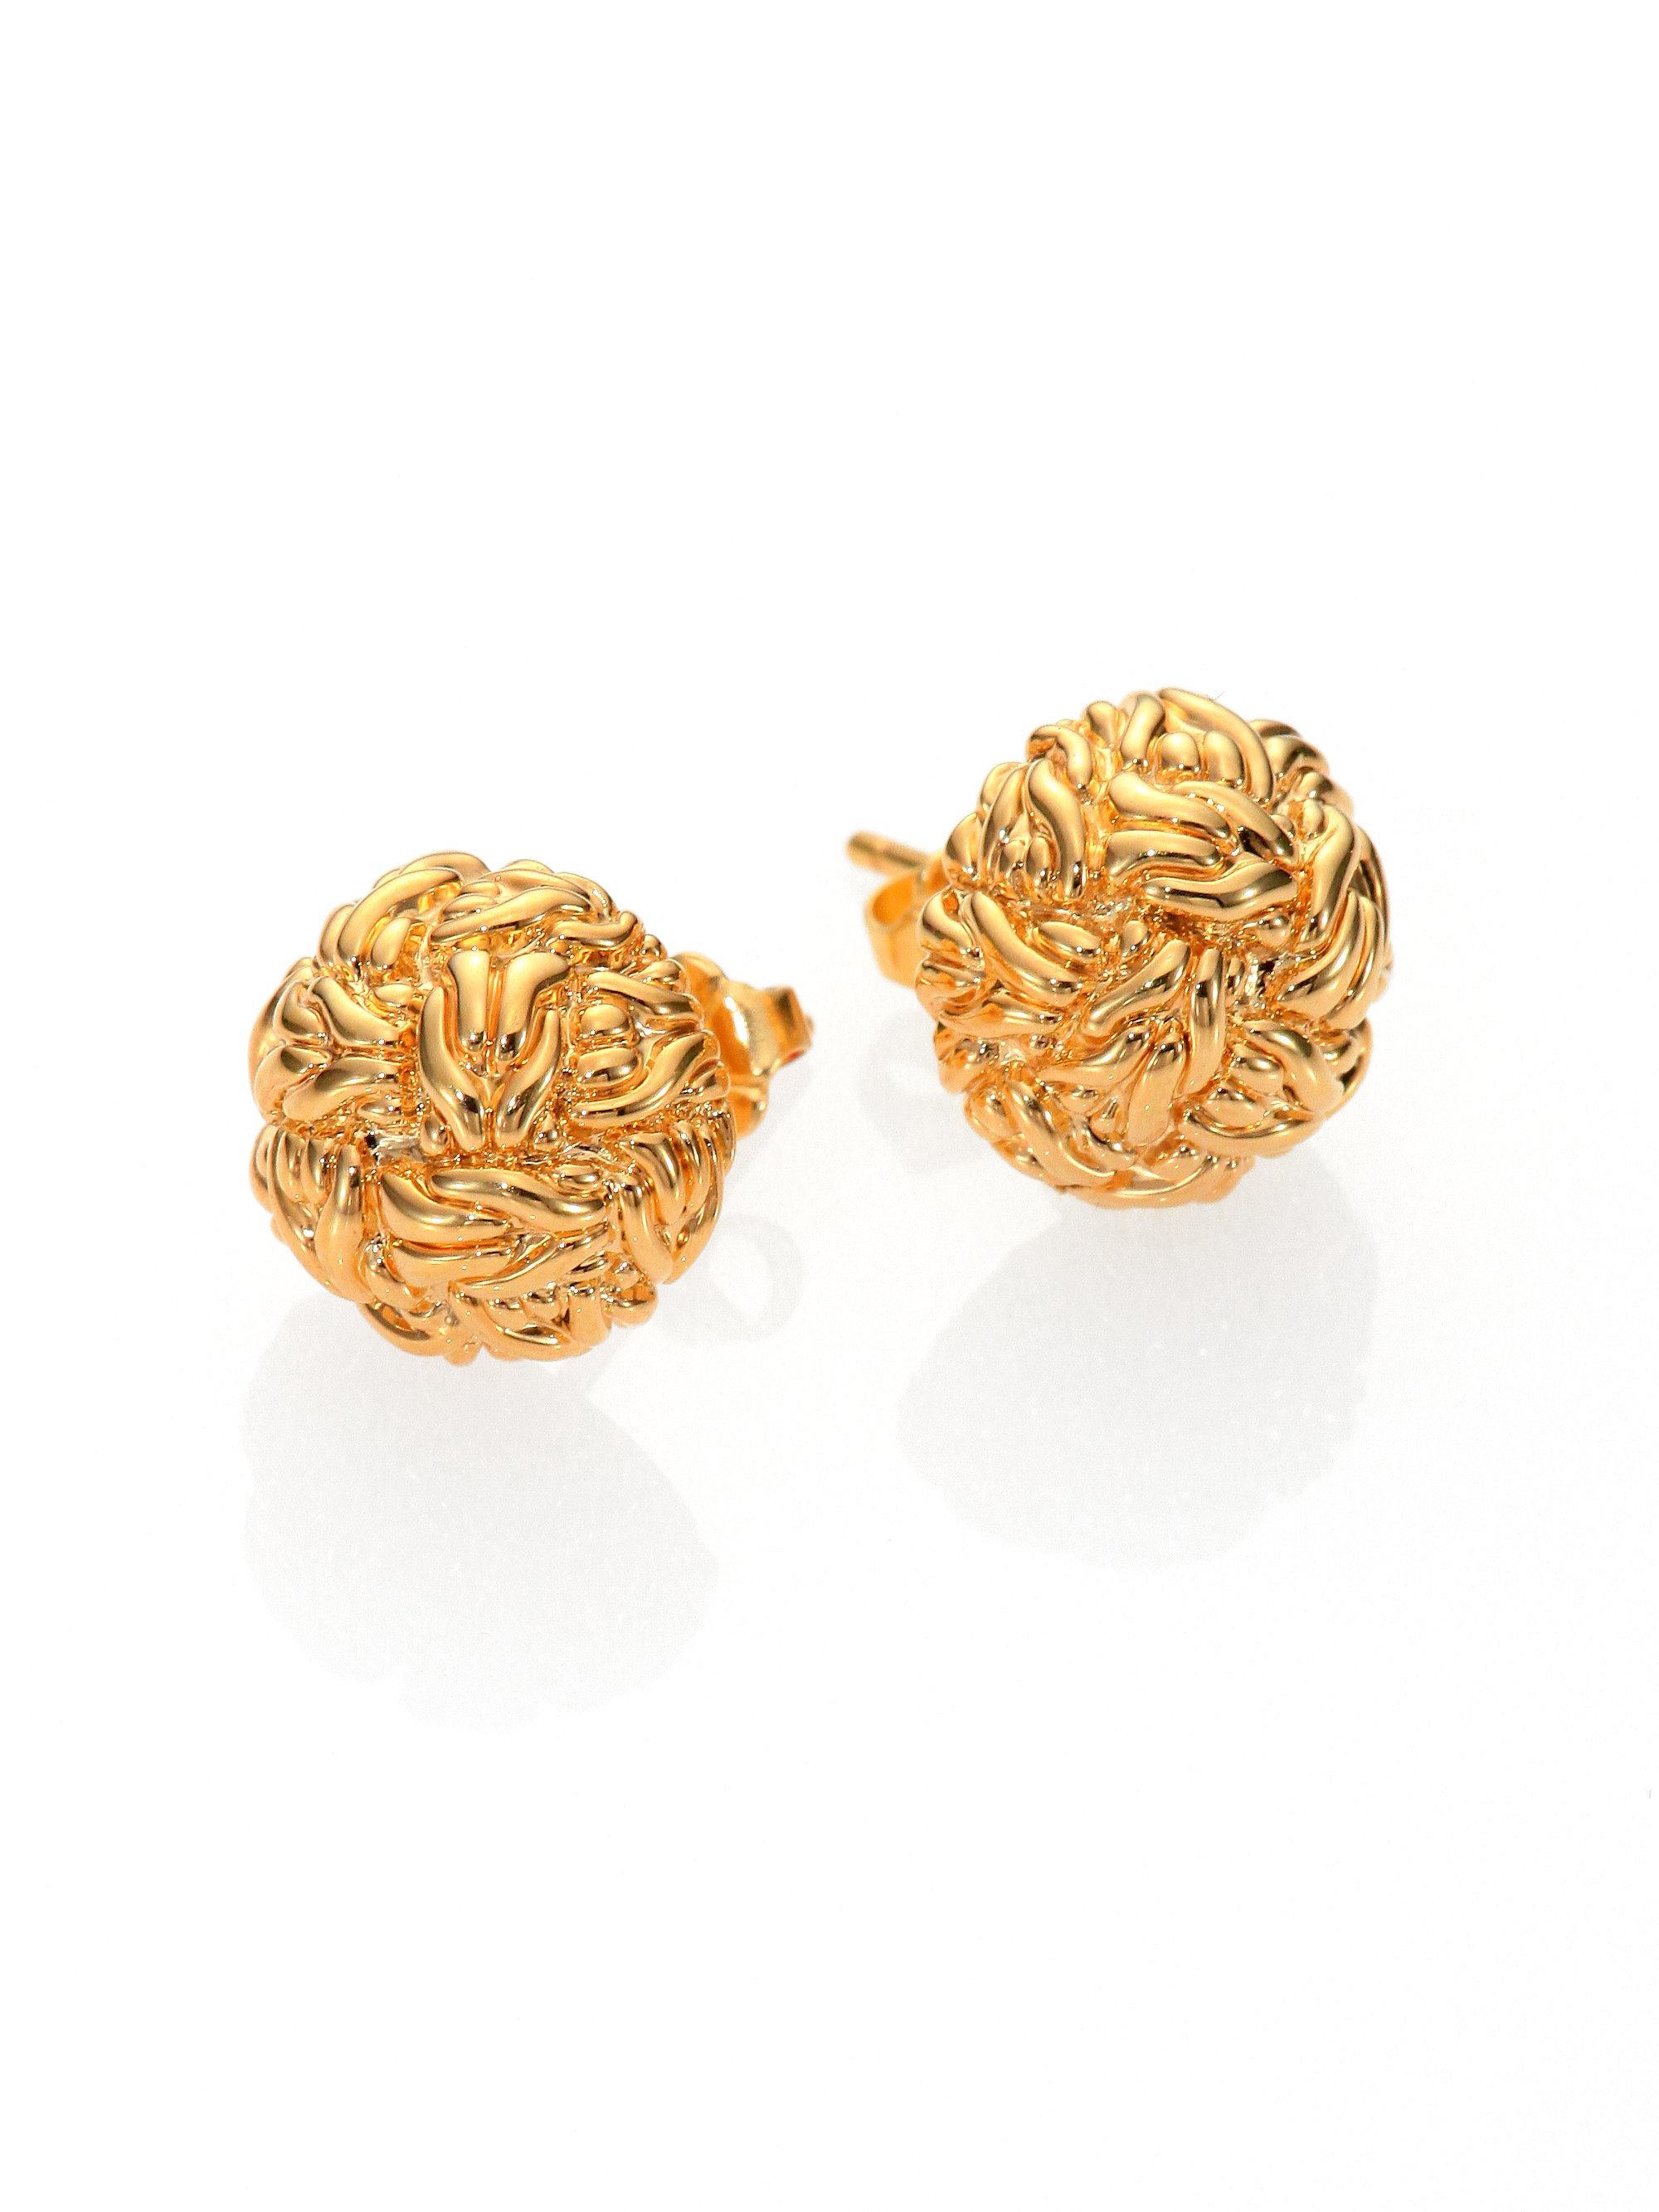 John Hardy Women S Metallic Clic Chain 18k Yellow Gold Stud Earrings